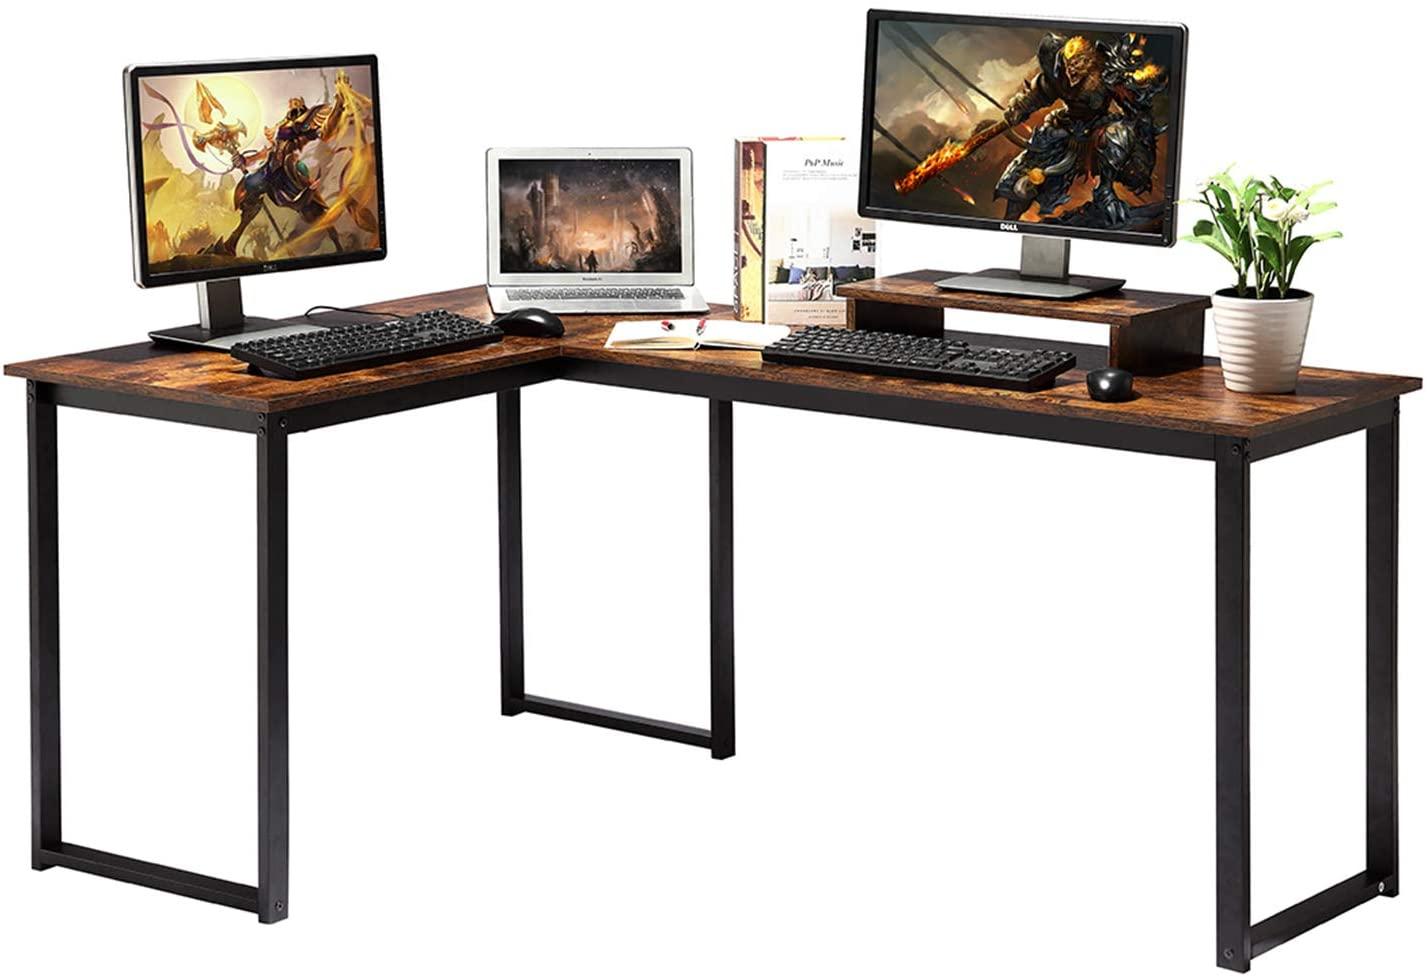 ZCH Computer Desk, Rustic Brown